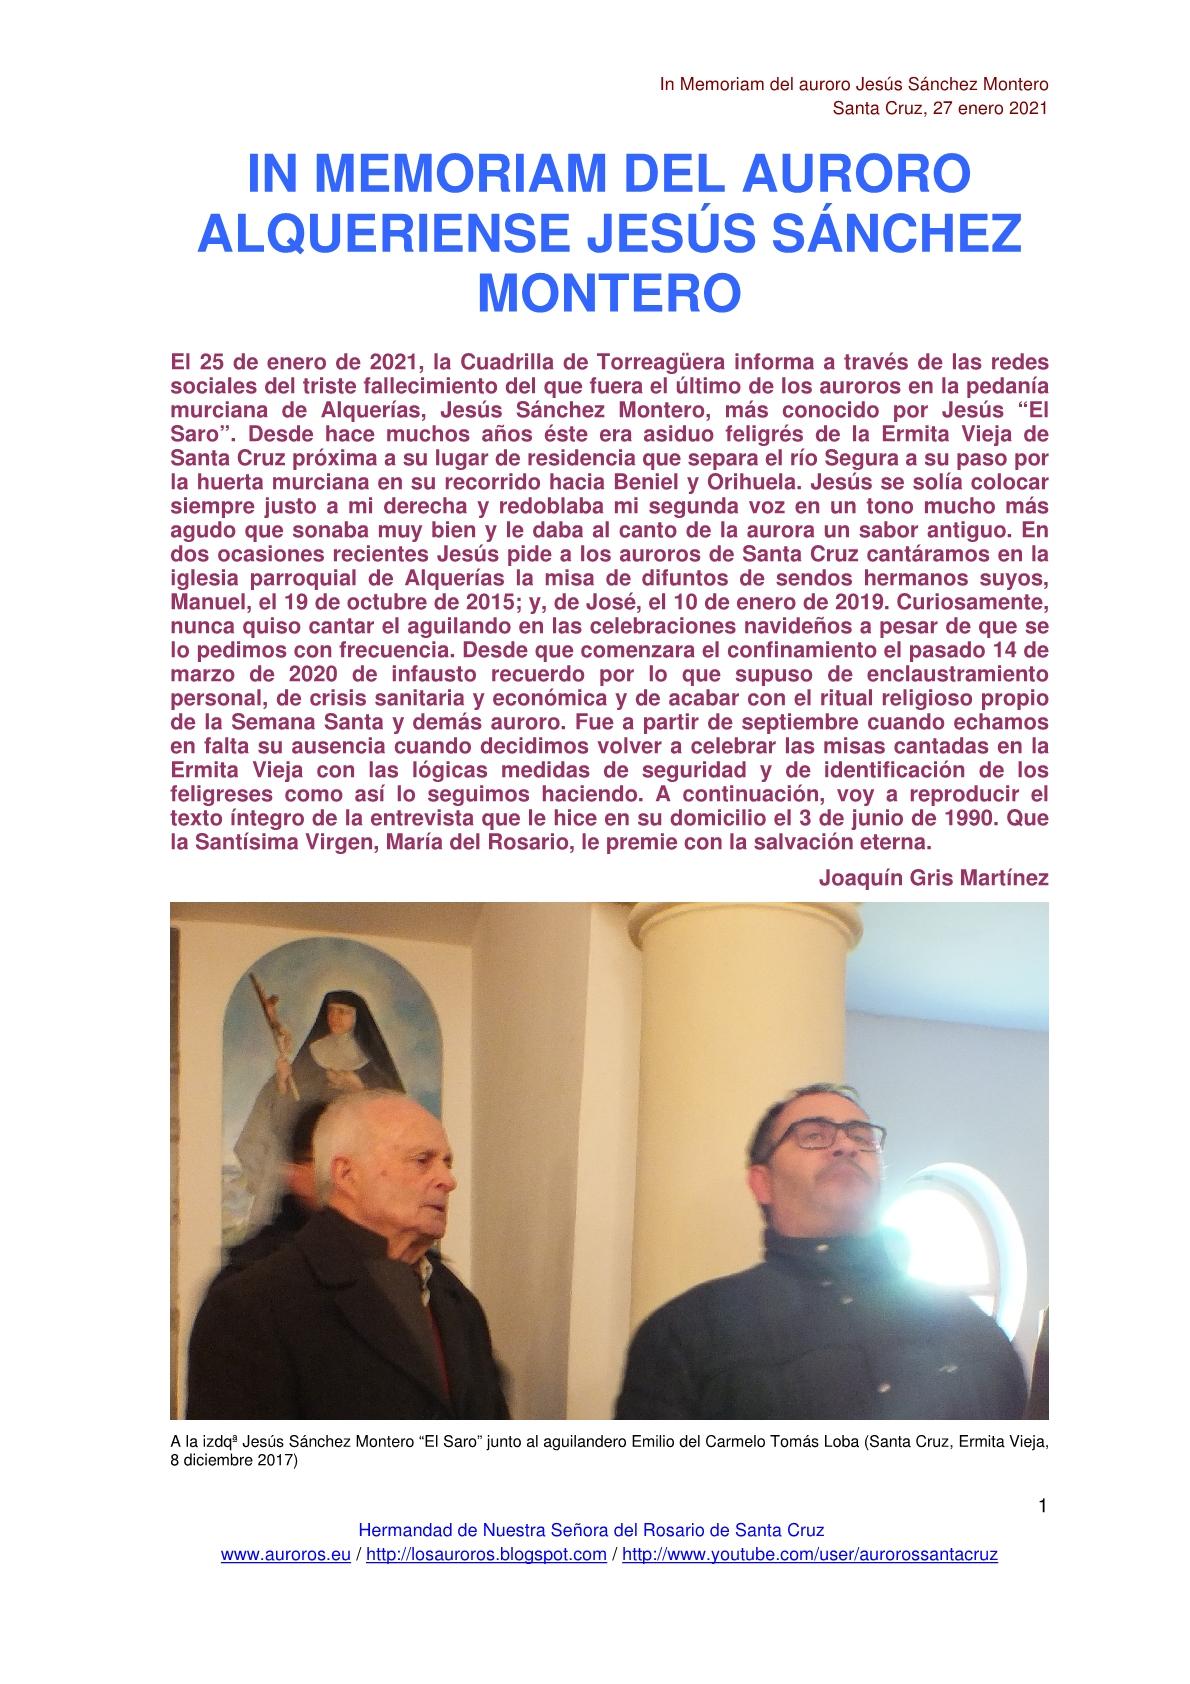 IN MEMORIAM DEL AURORO ALQUERIENSE JESÚS SÁNCHEZ MONTERO